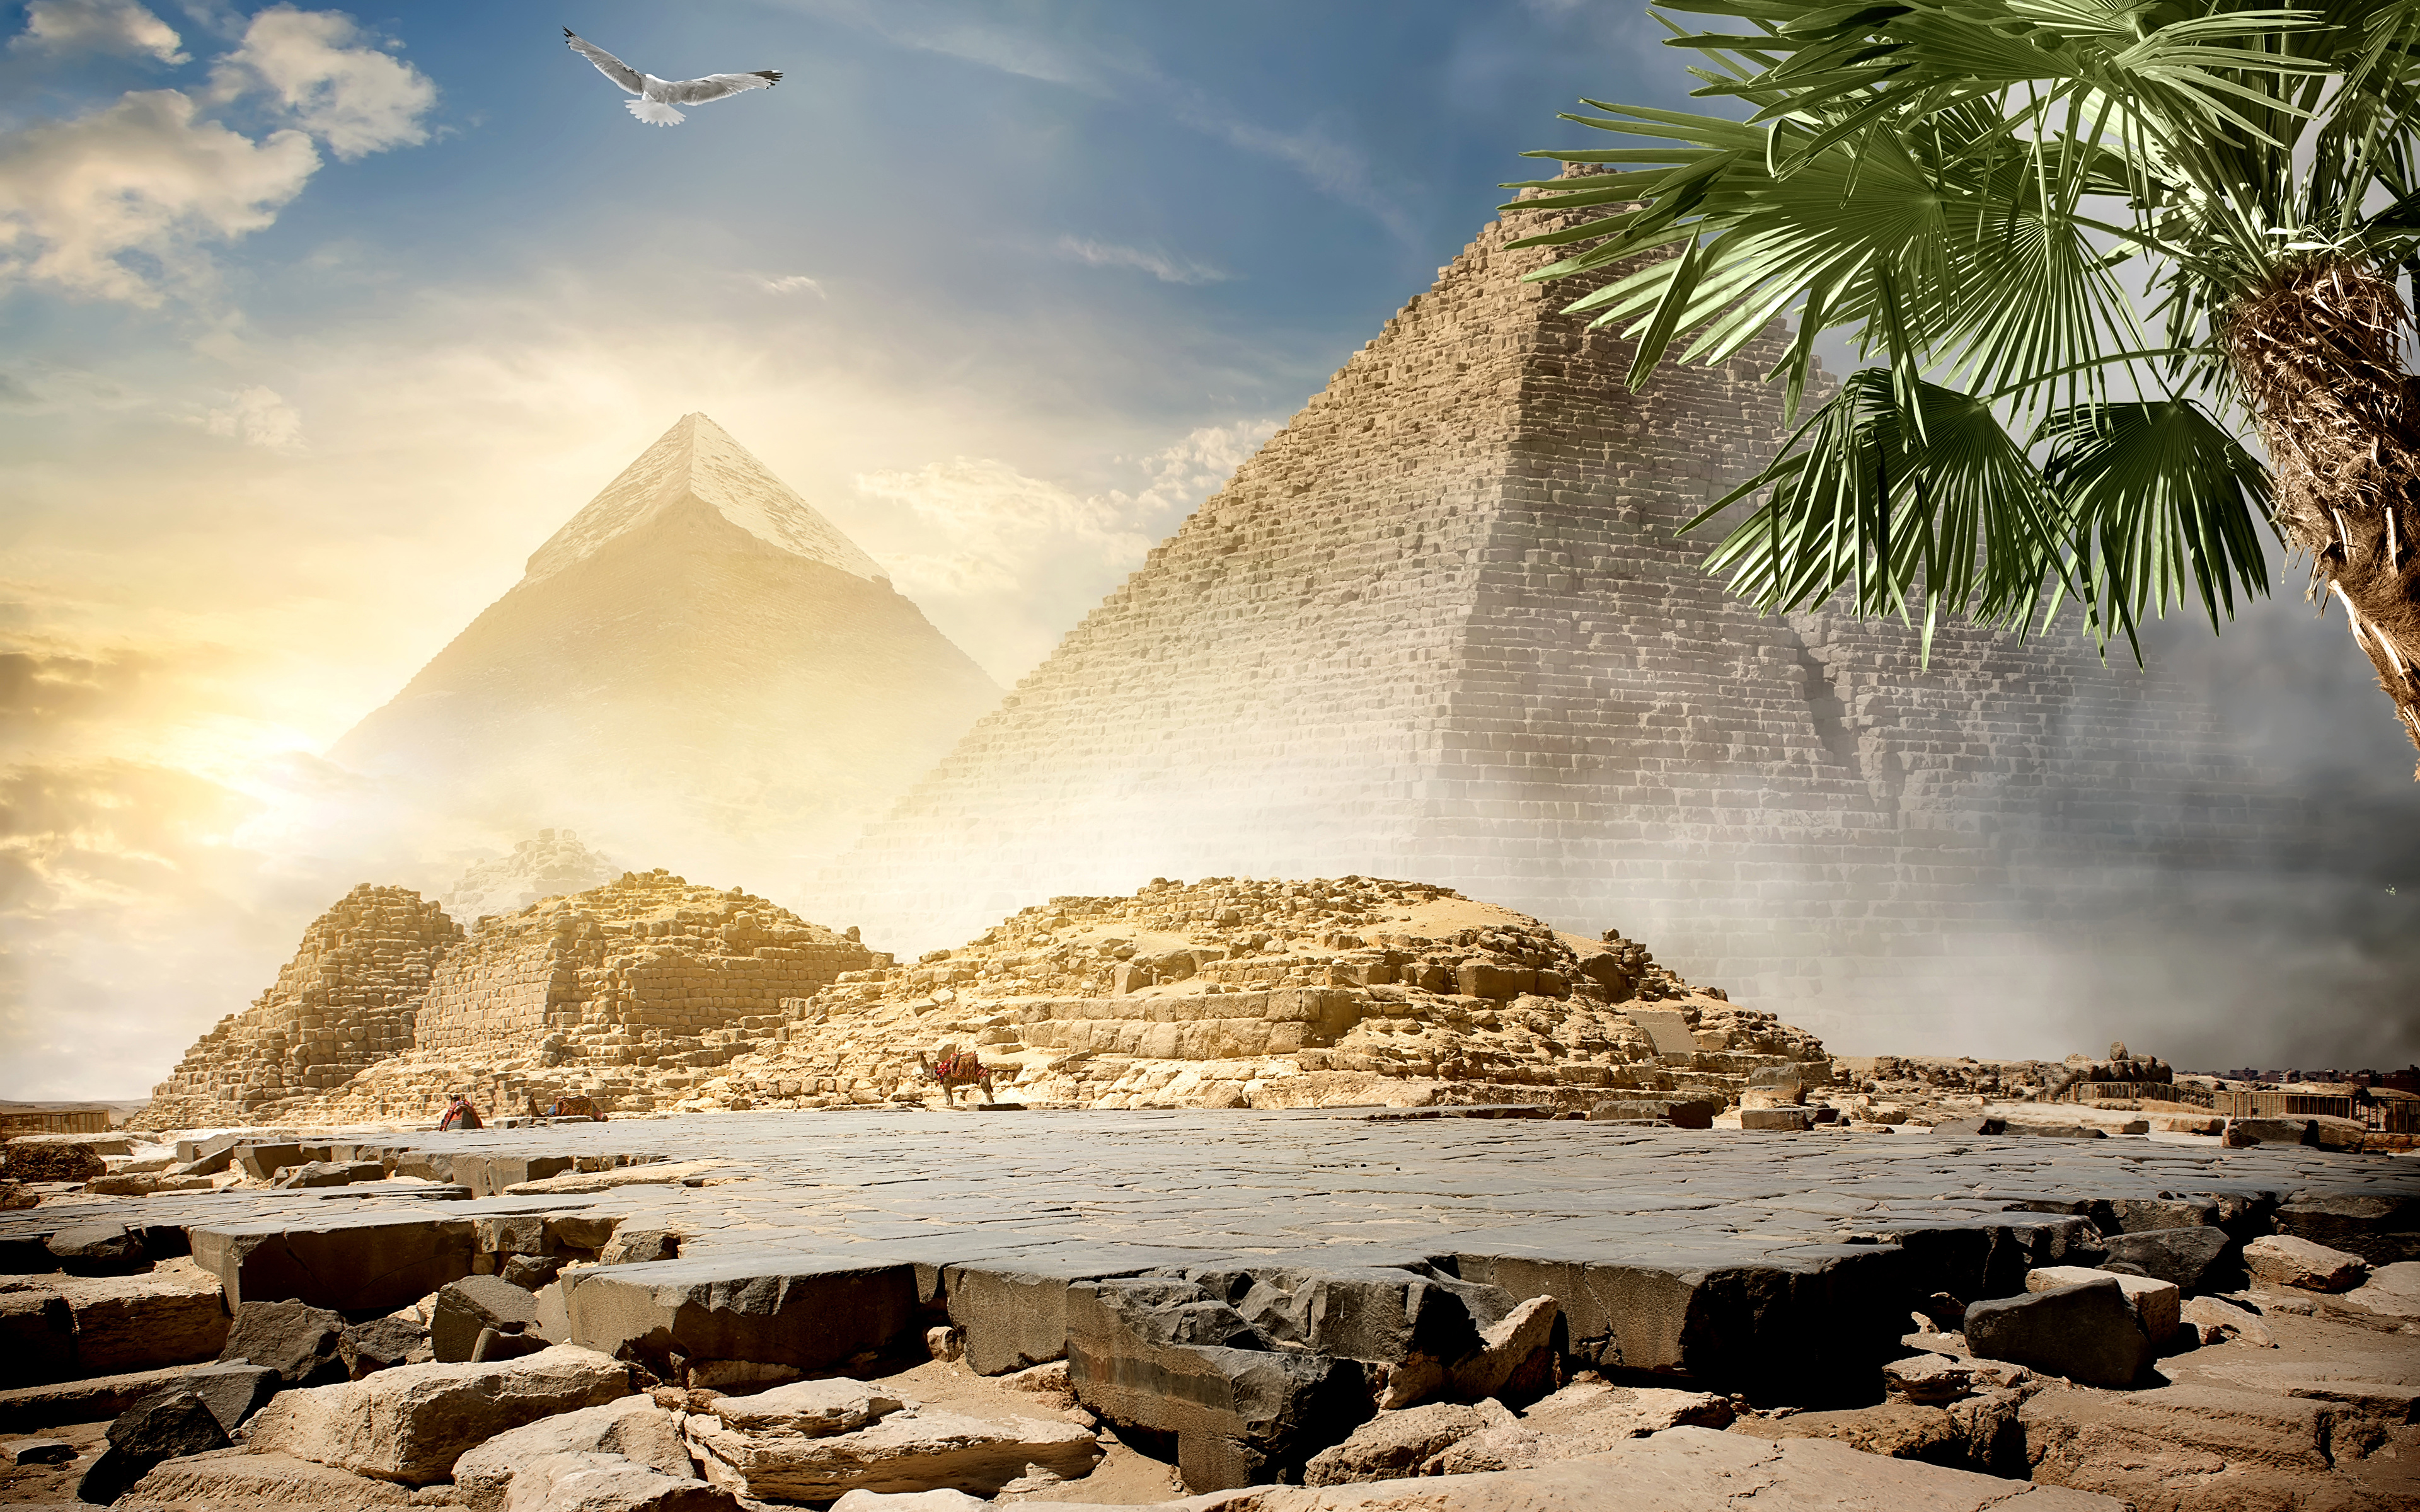 Egypt_Desert_Stones_Sky_Cairo_Pyramid_53